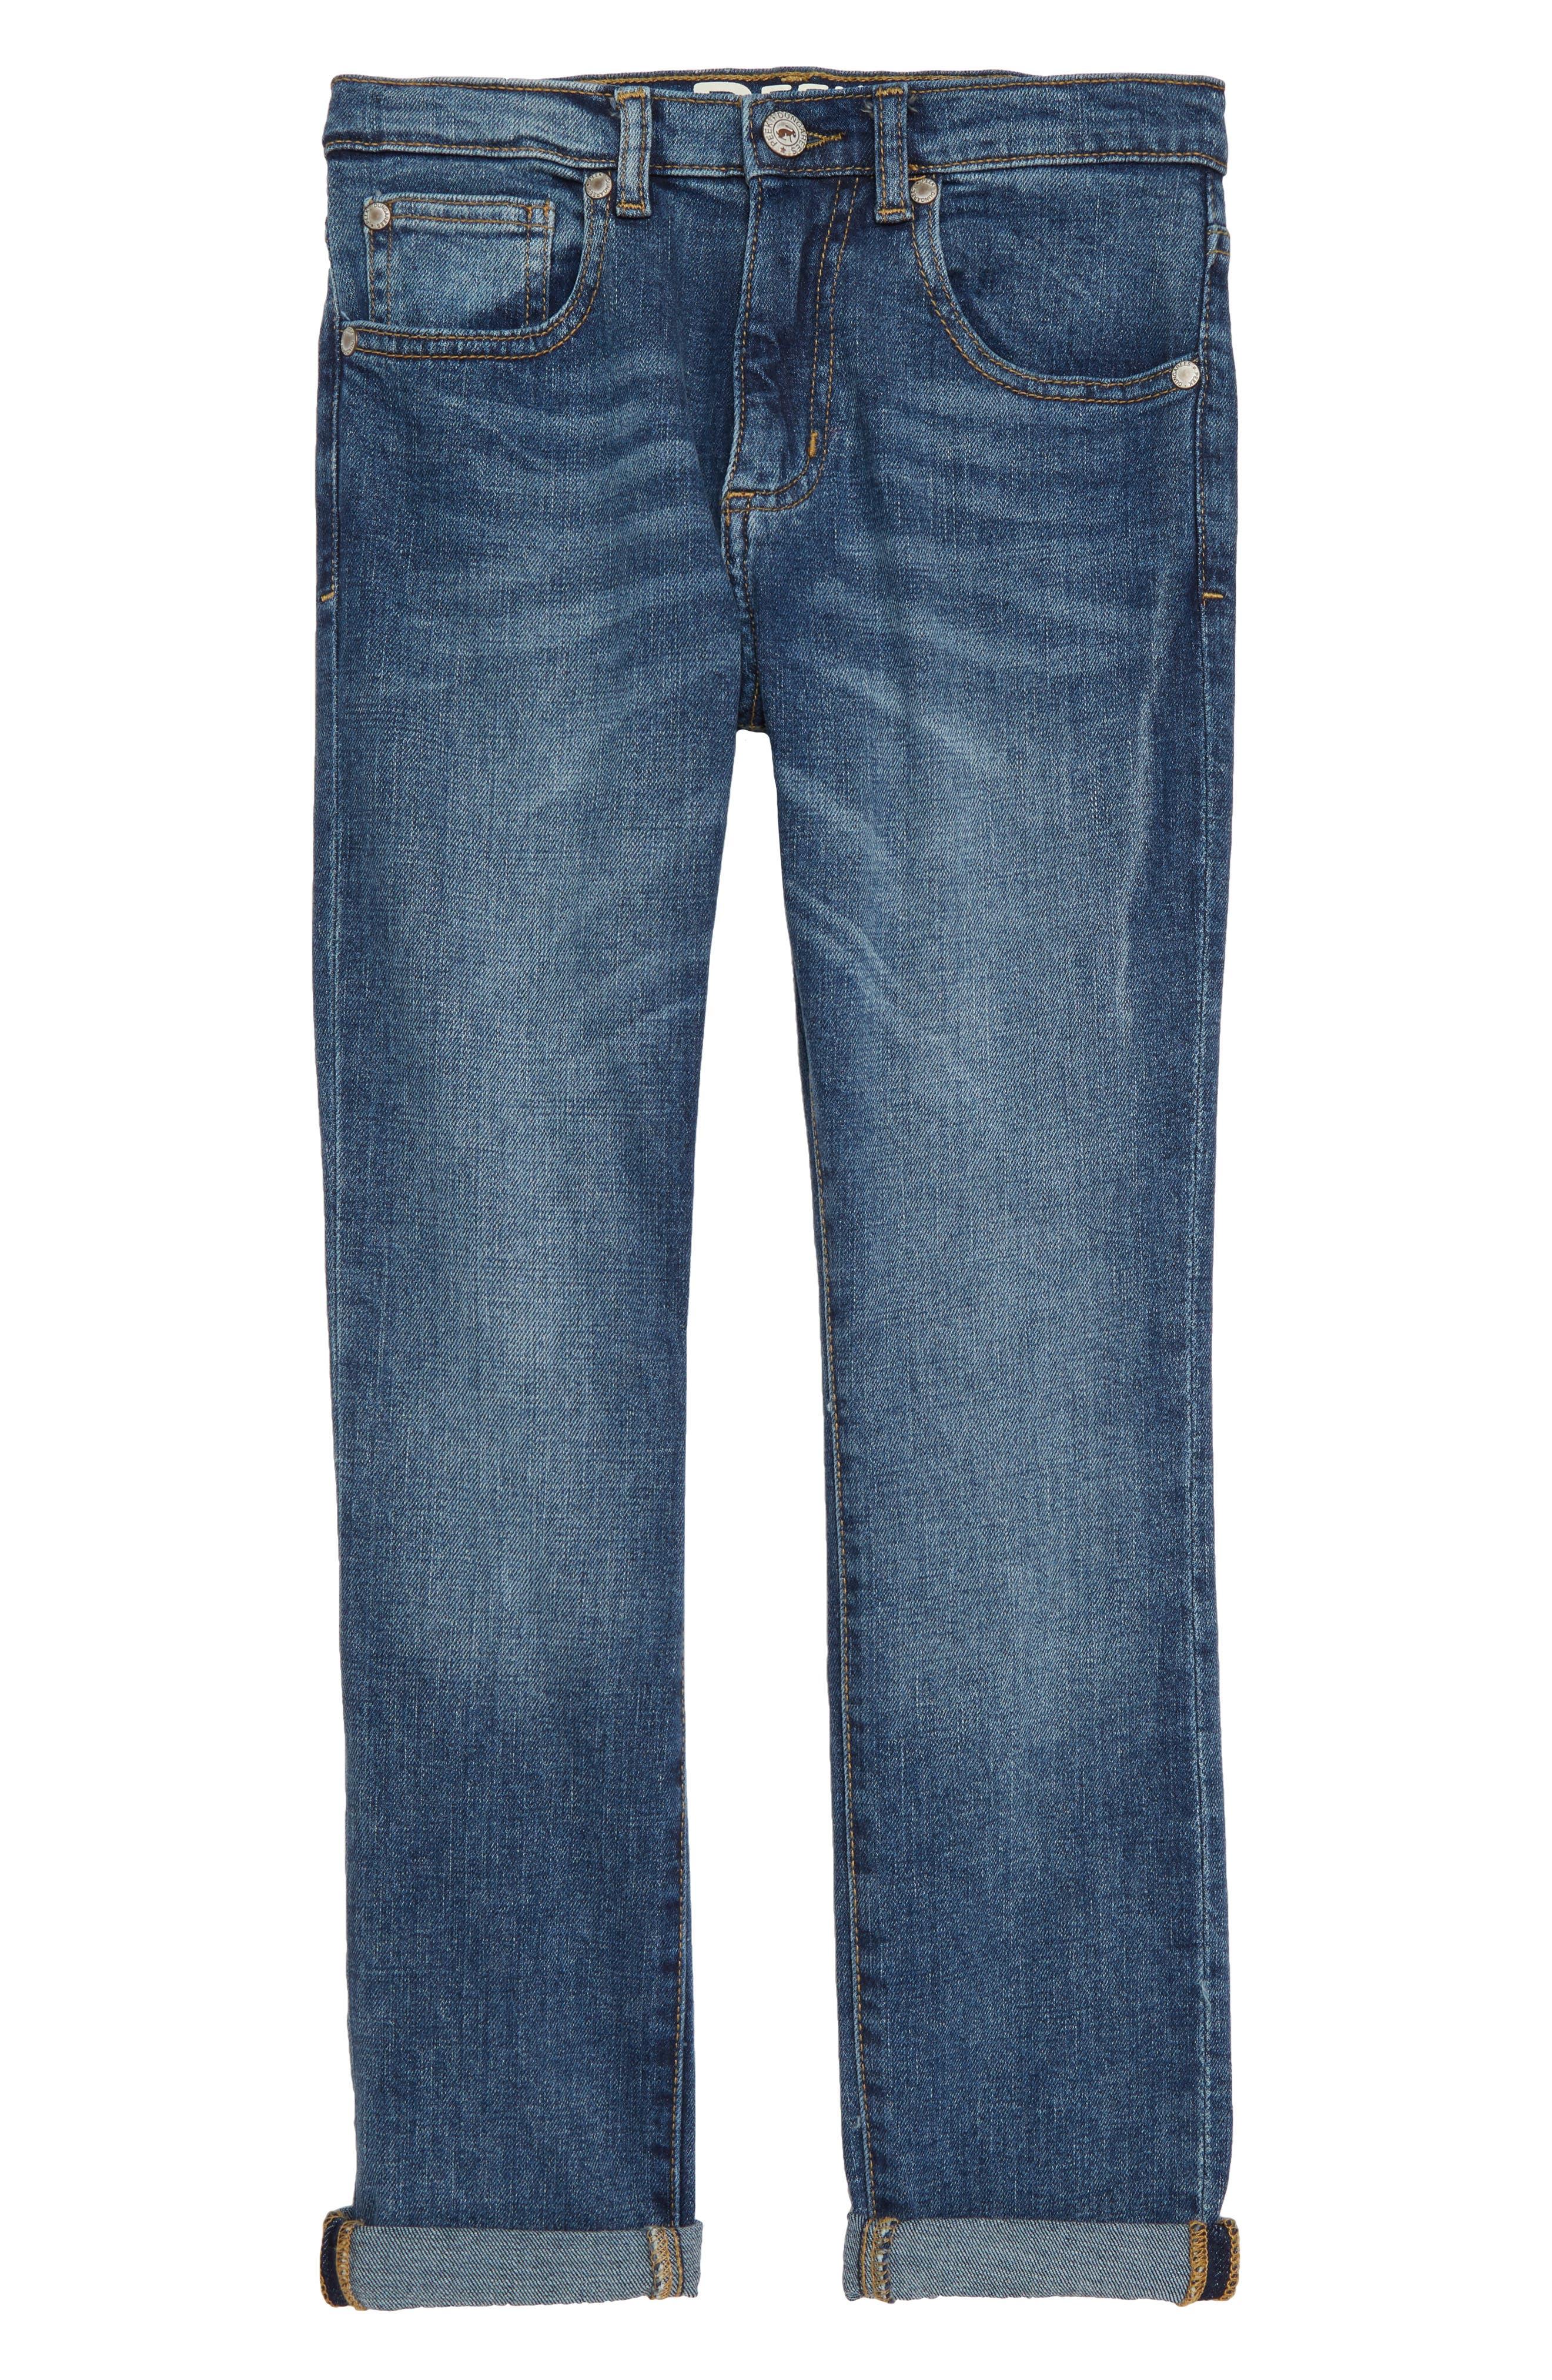 Slouch Jeans,                             Main thumbnail 1, color,                             400